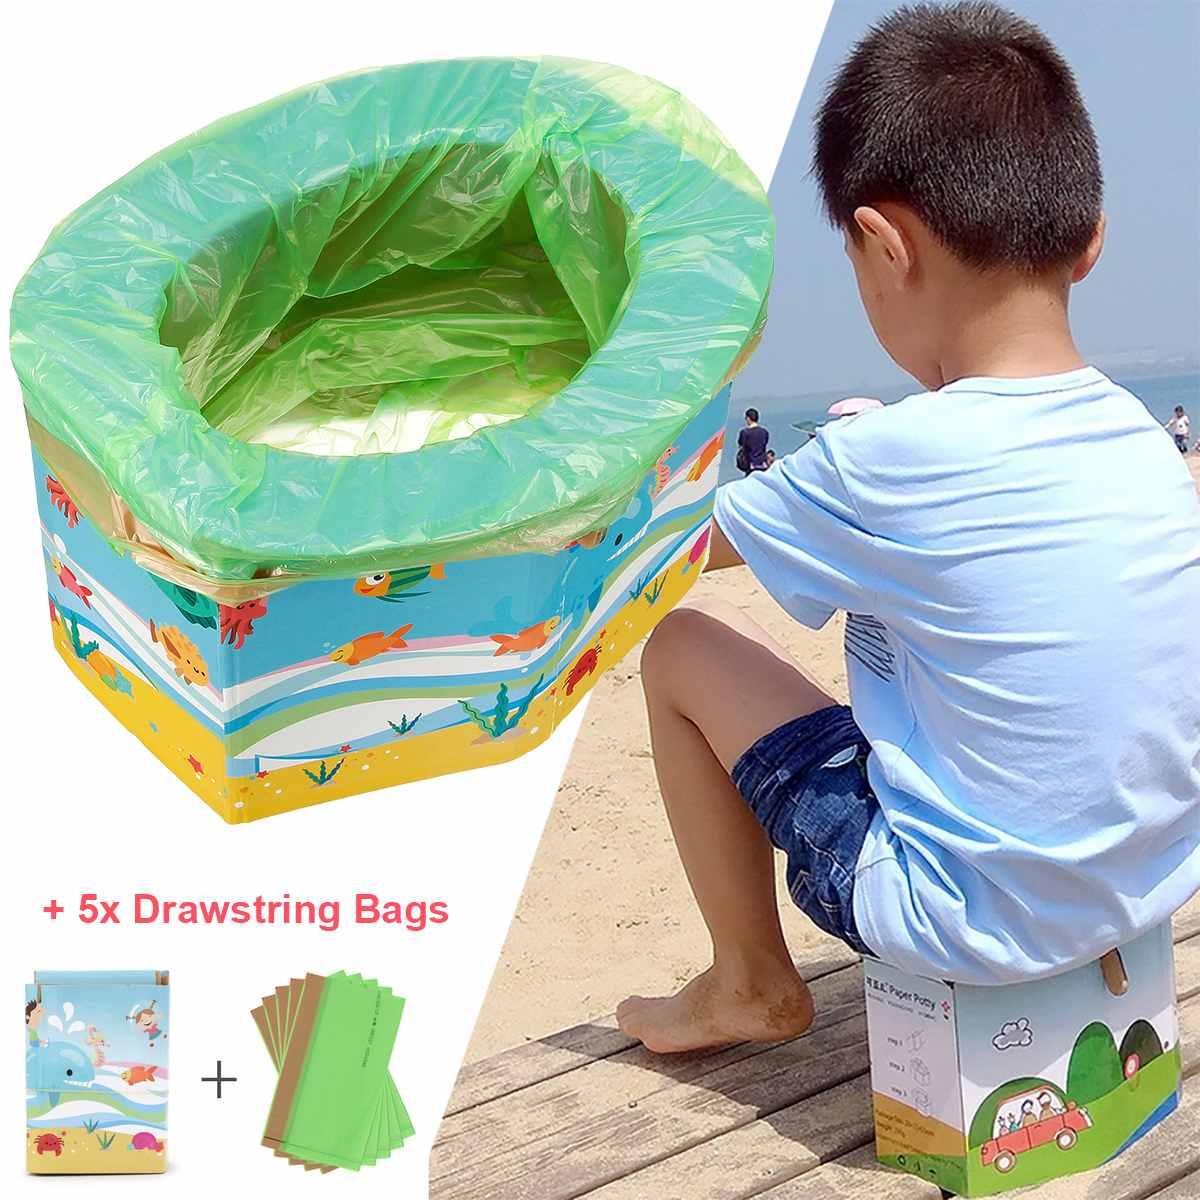 Foldable Child Kids Portable Folding Potty Seat Boys Girls Baby Travel Toilet Training Infant Emergency Potties With Free Bags